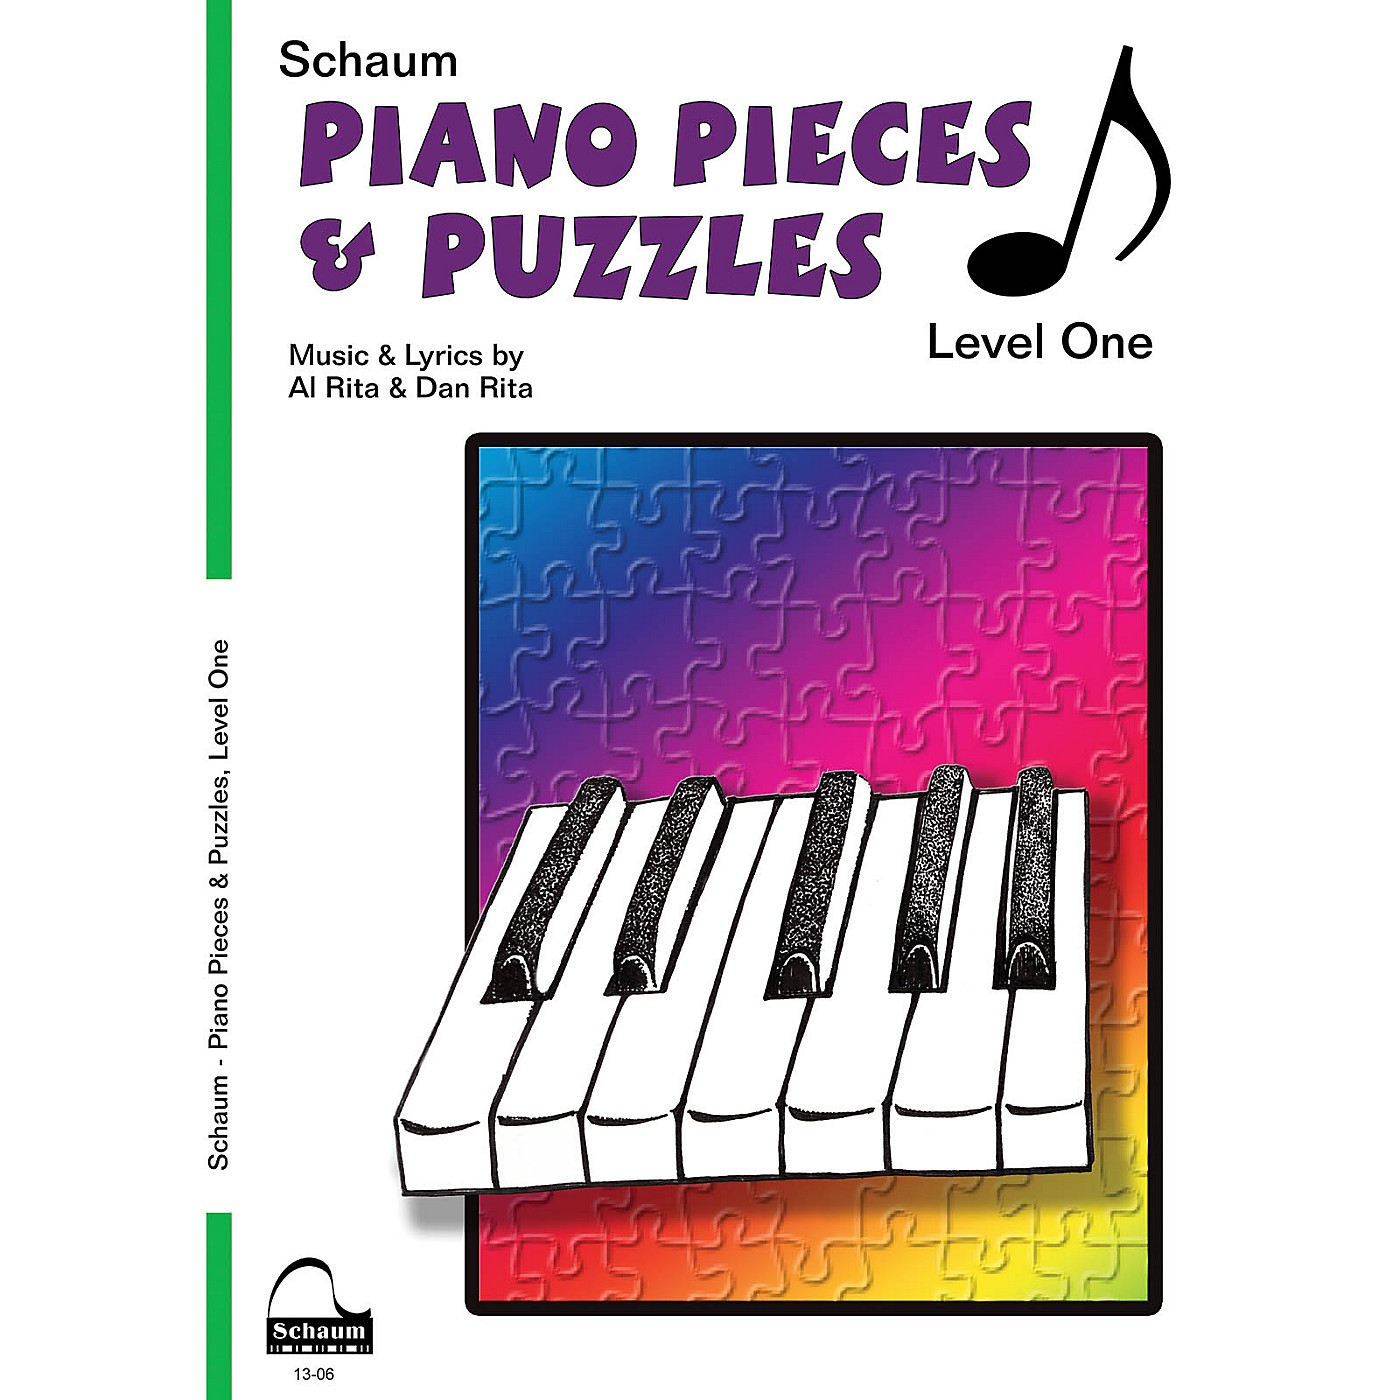 SCHAUM Piano Pieces & Puzzles (Level 1 Elem Level) Educational Piano Book by Al Rita thumbnail